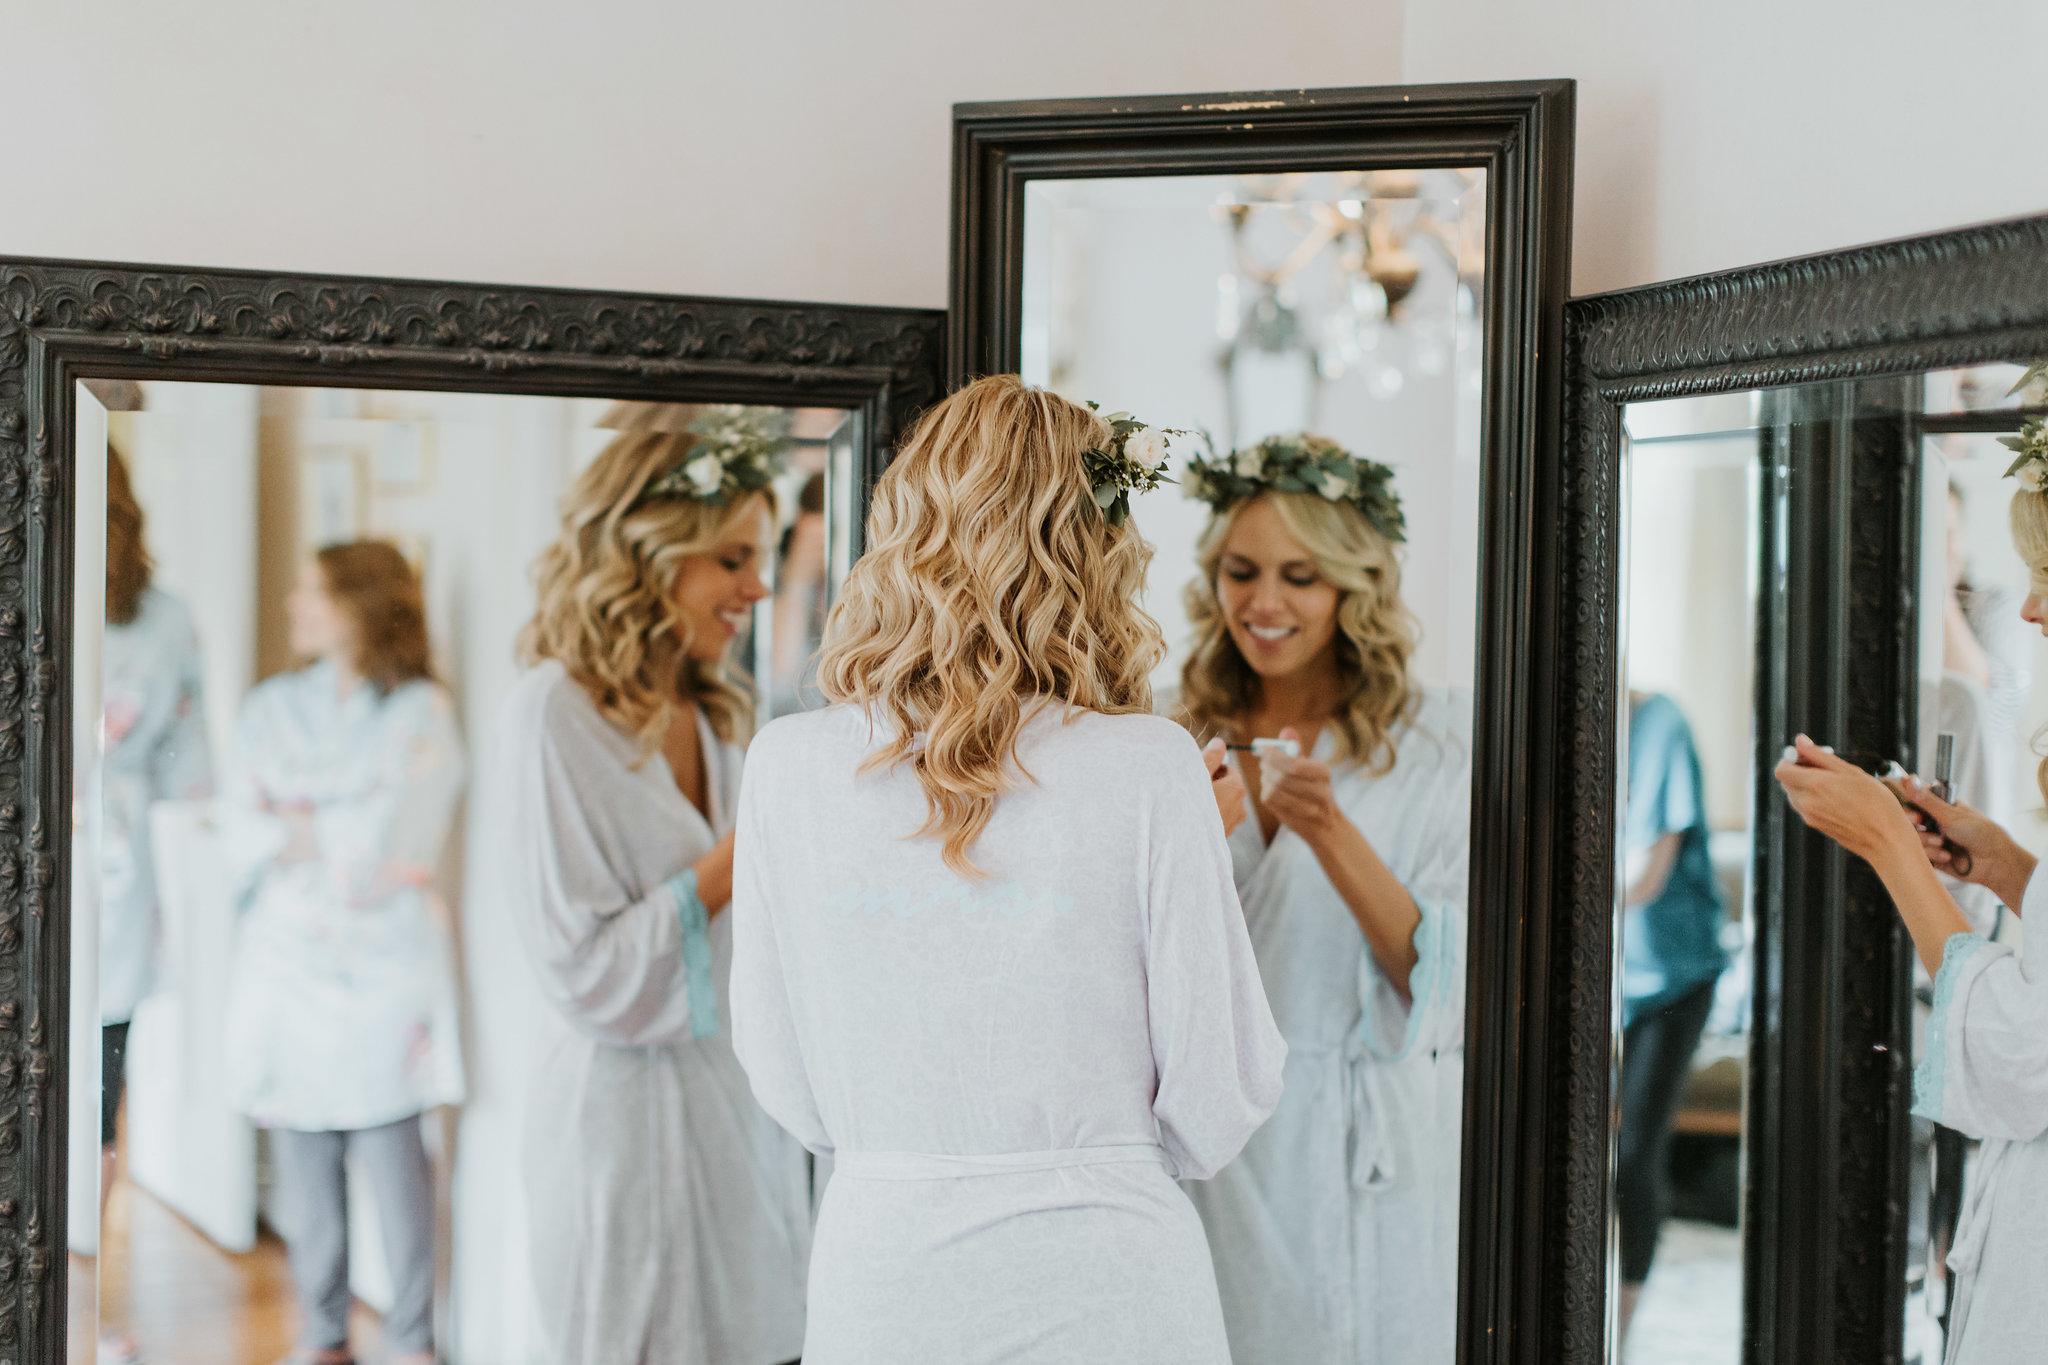 Legare-Waring-House-Charleston-SC-wedding-portrait-photography-8.jpg